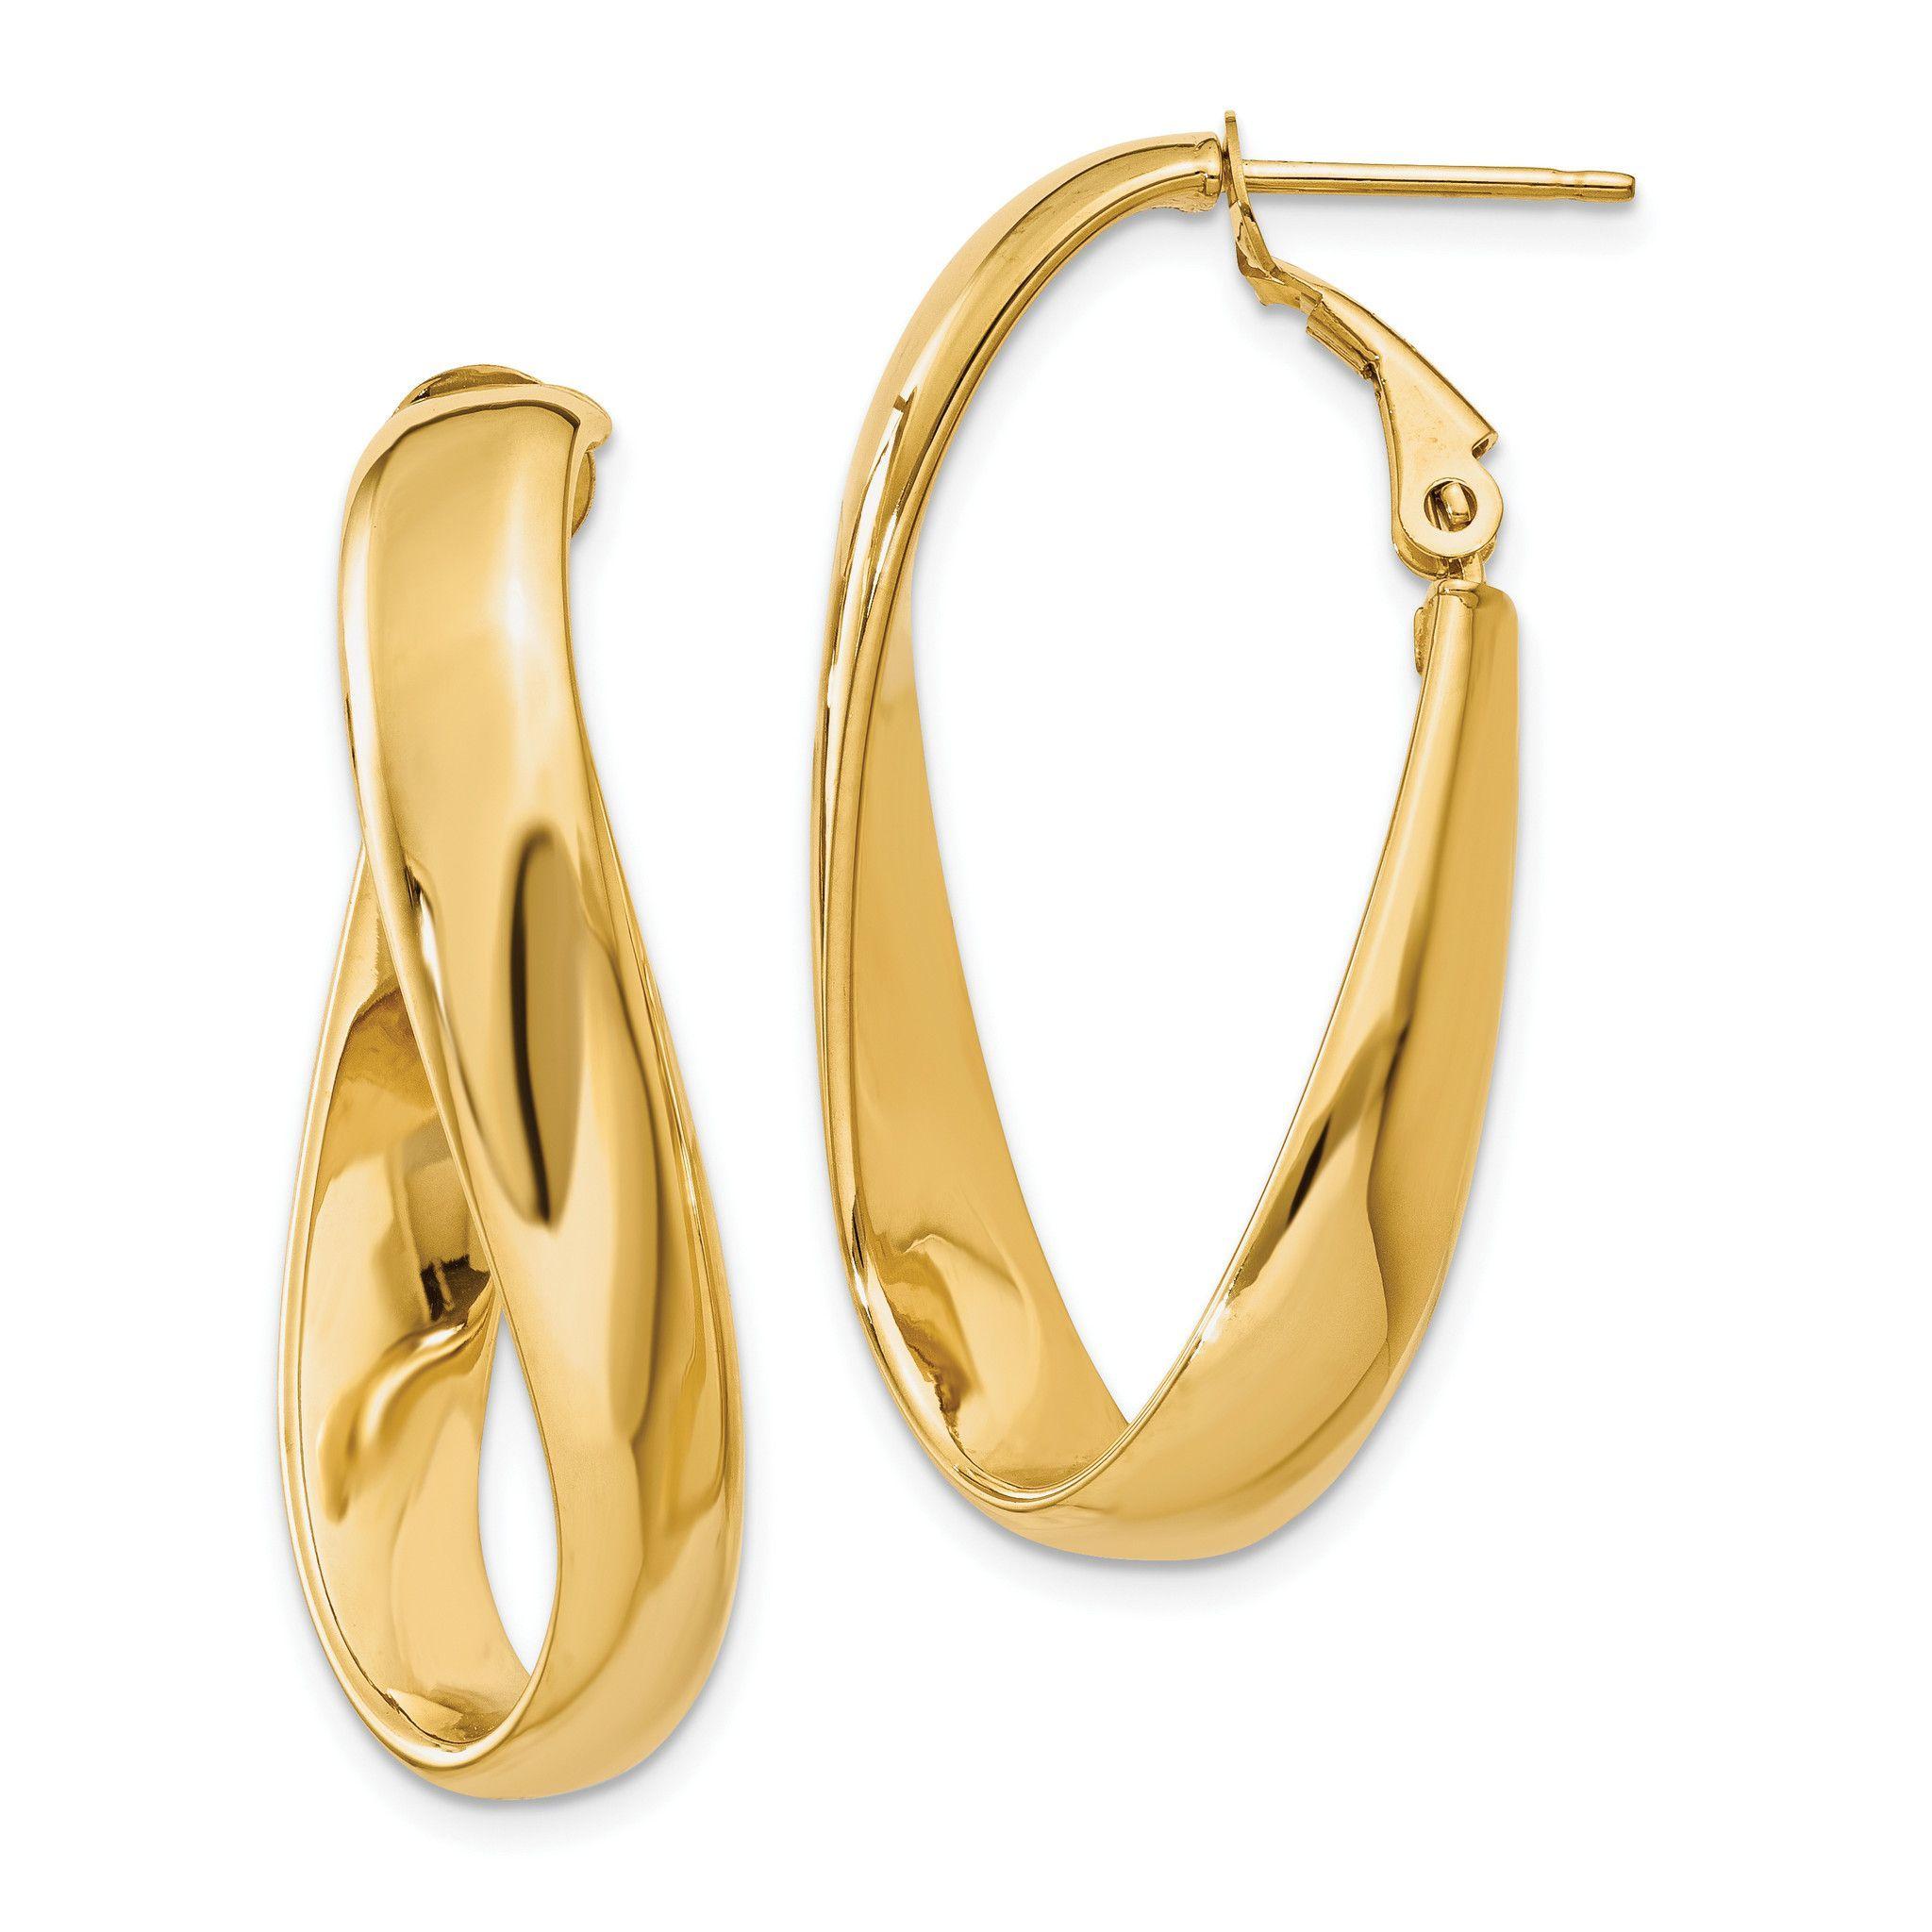 14k Twisted Oval Hoop Earrings PRE691